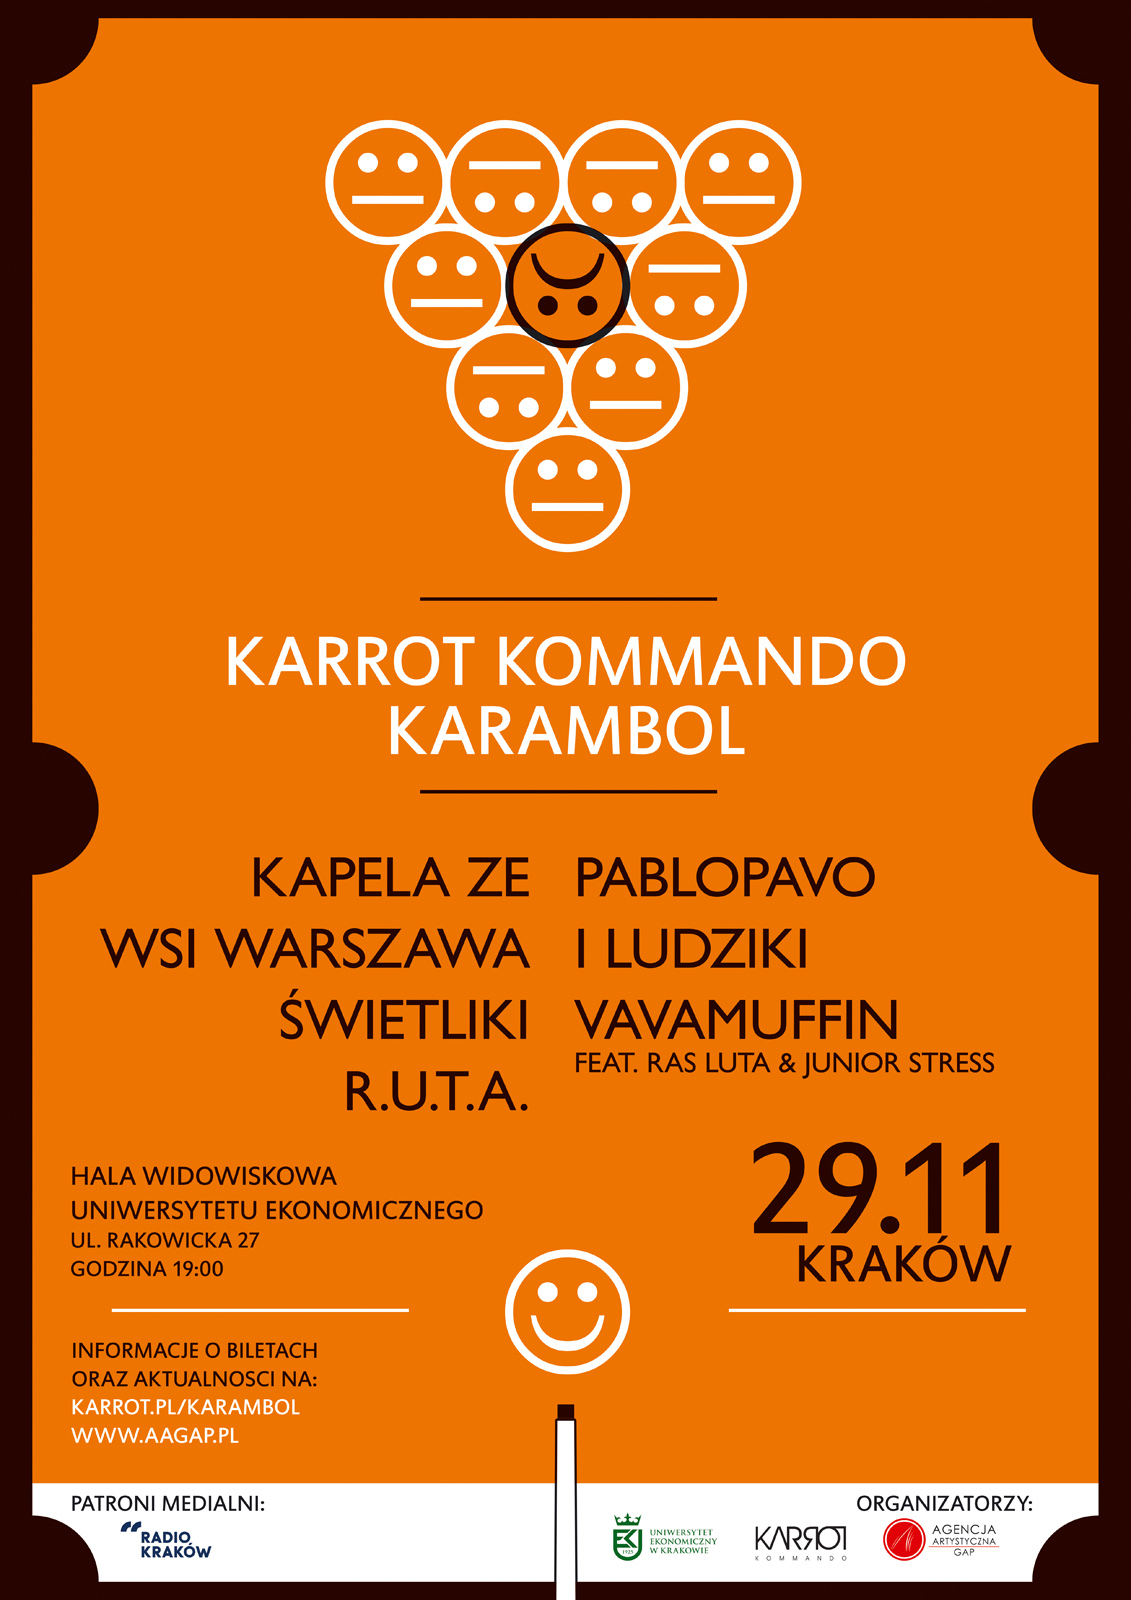 Karrot Komando Festival, plakat, (źródło: materiały prasowe organizatora)